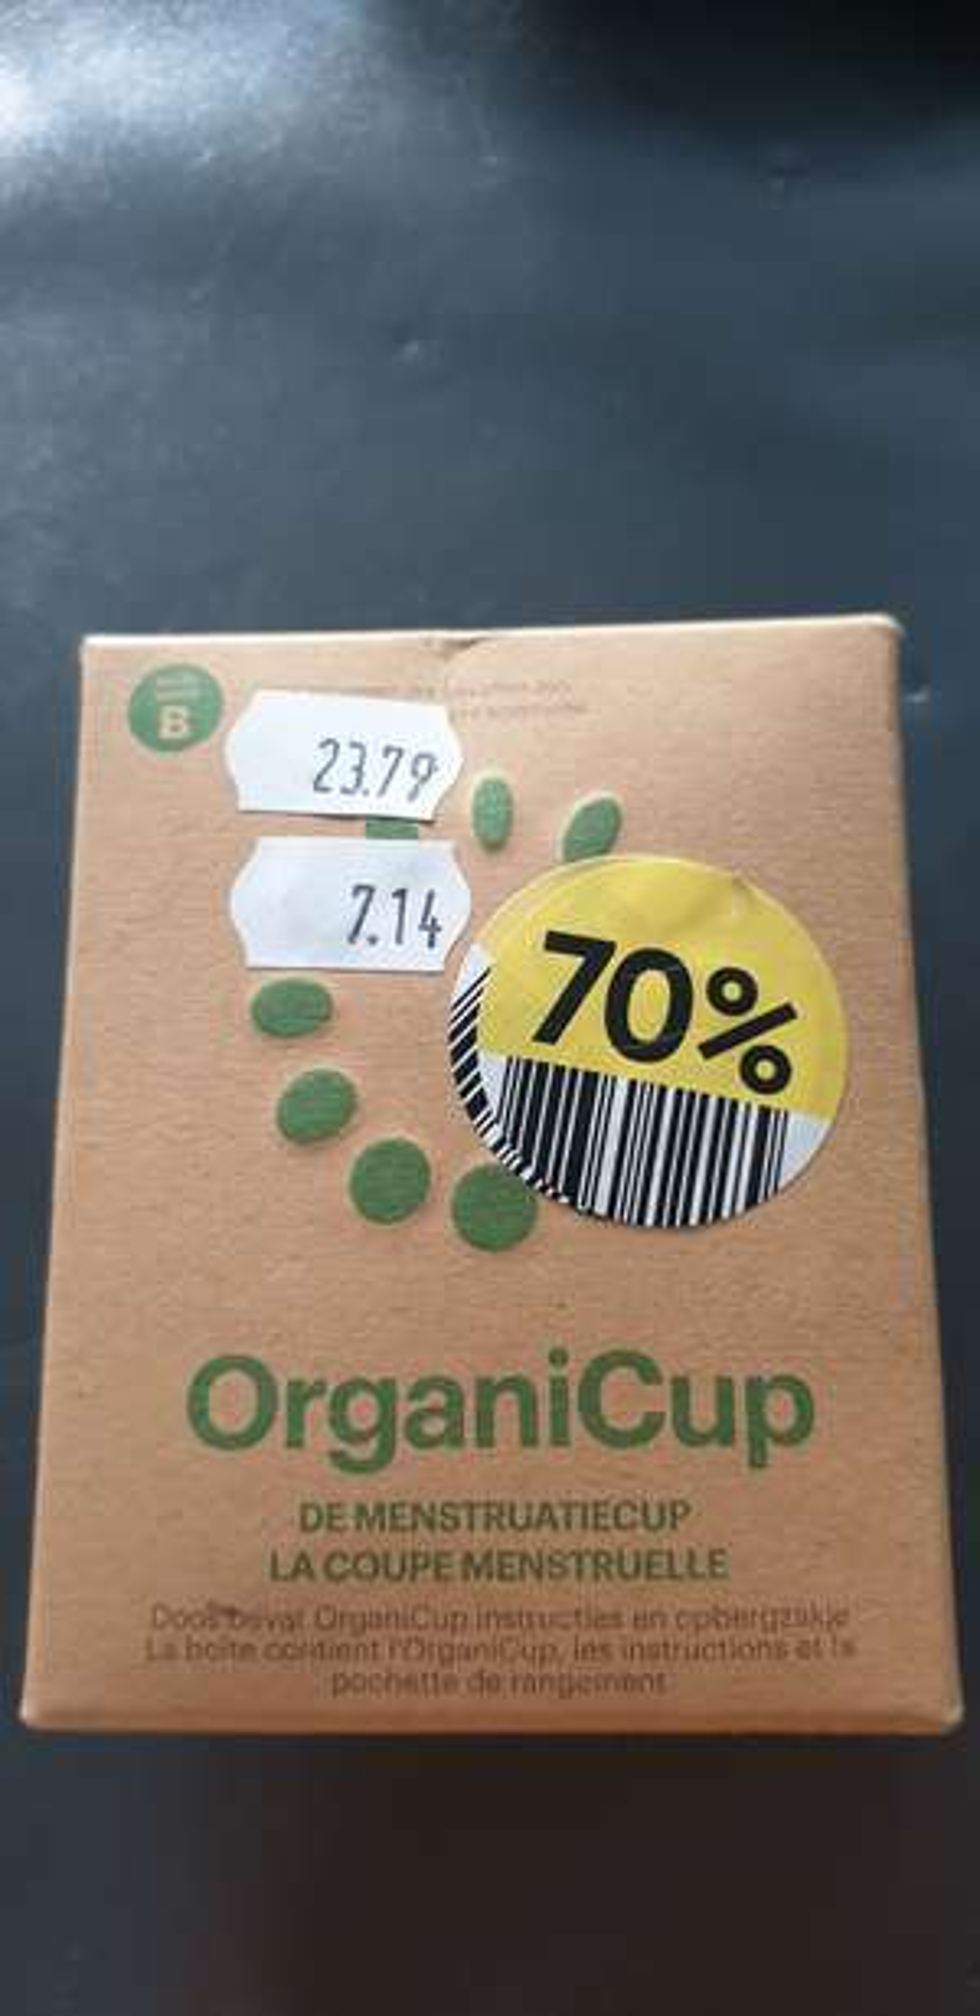 Organicup menstruatiecup 70% korting lokaal?